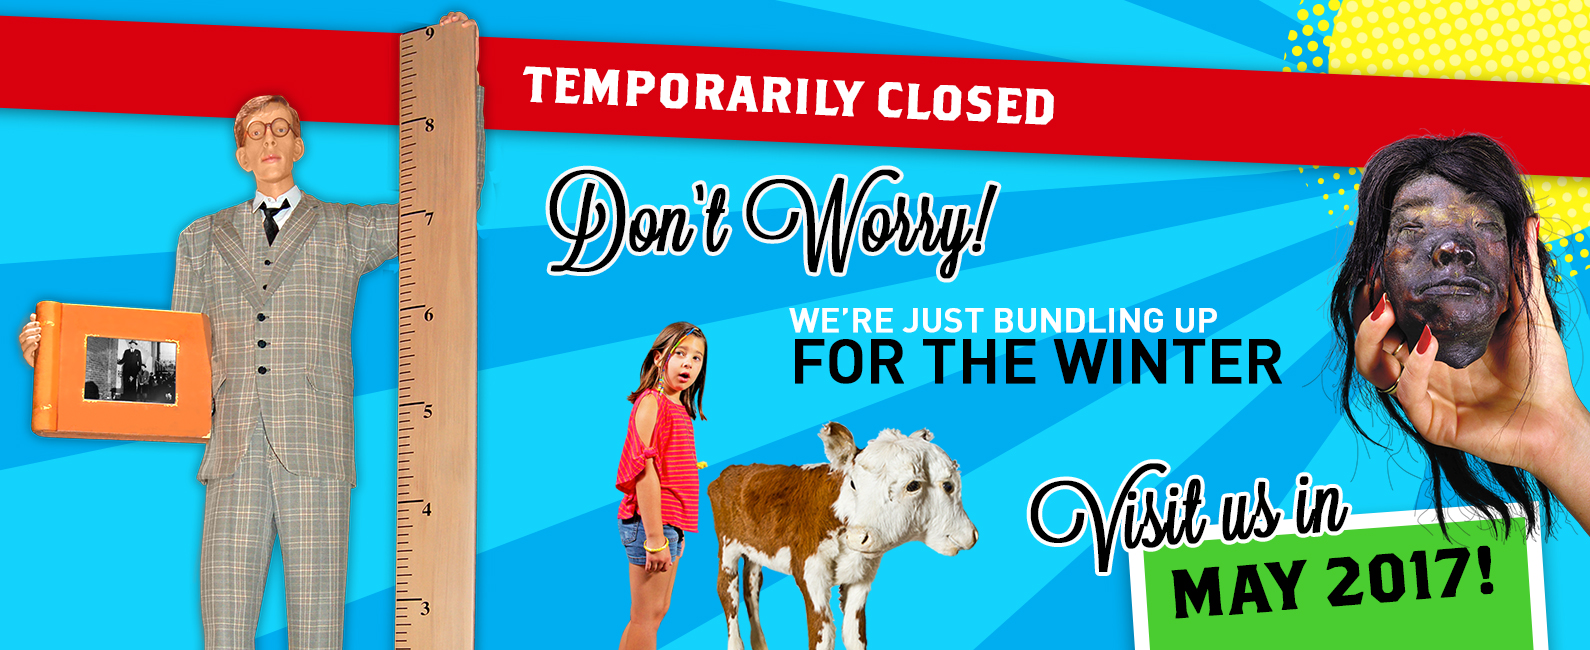 ClosedforWinter2016